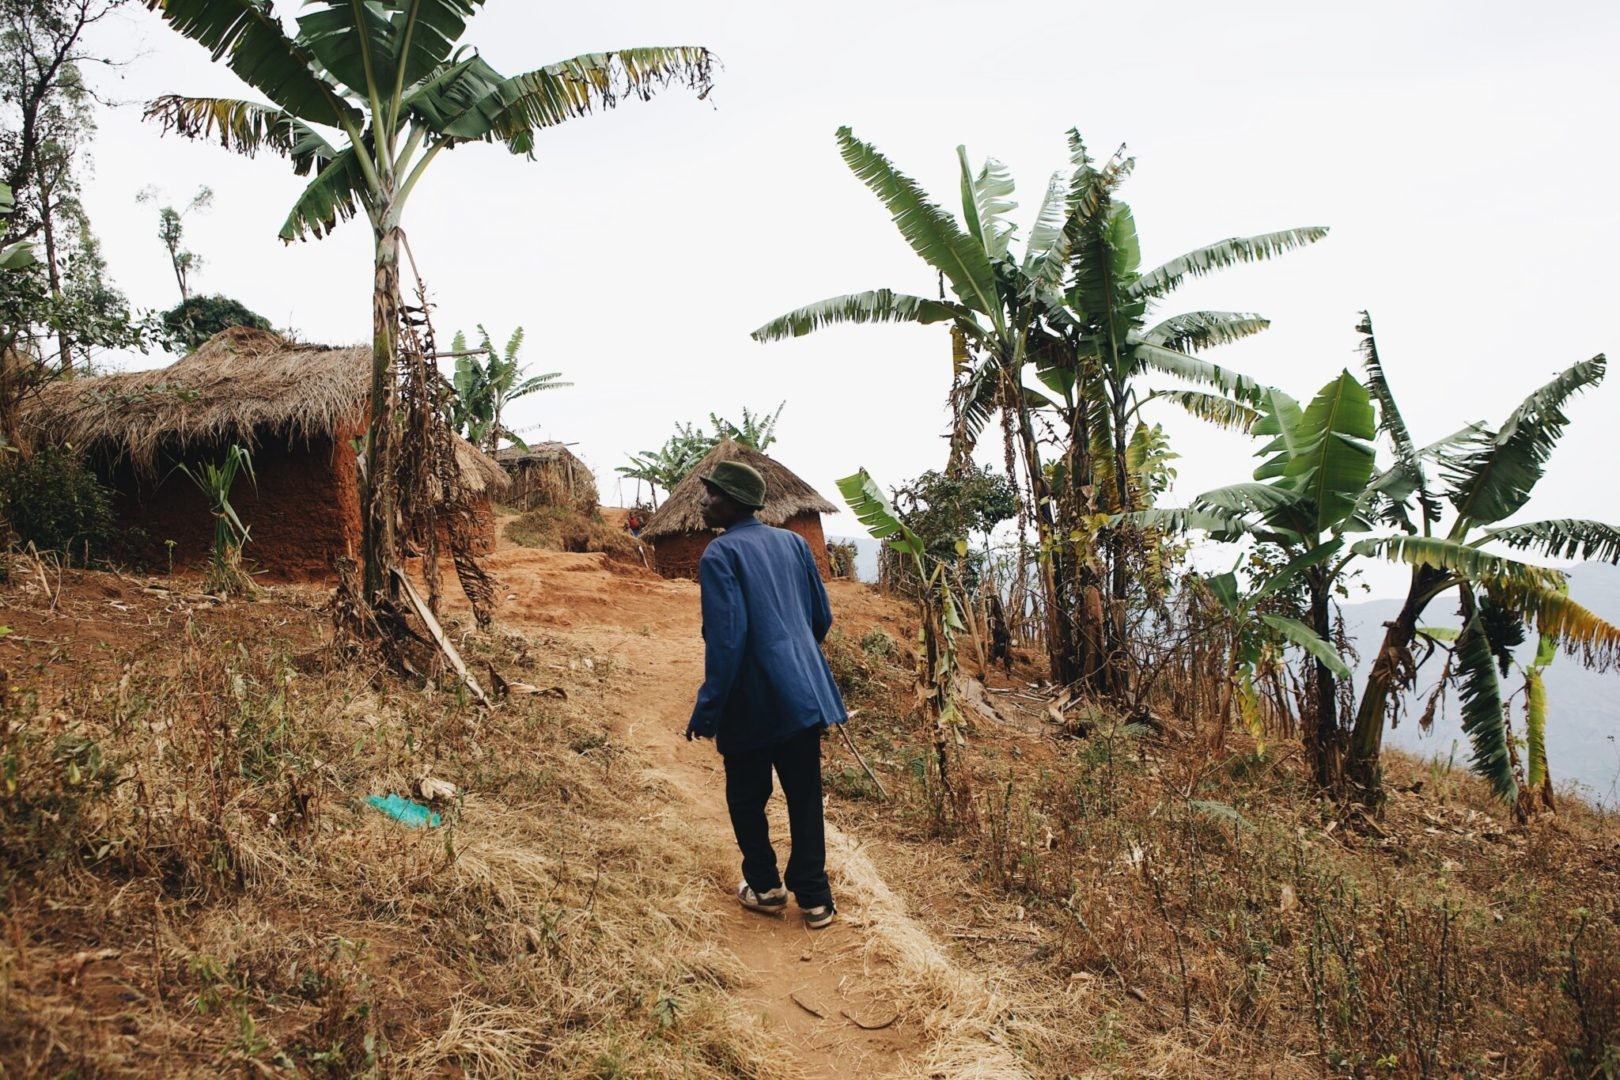 An elder walks to his village in the Congo.